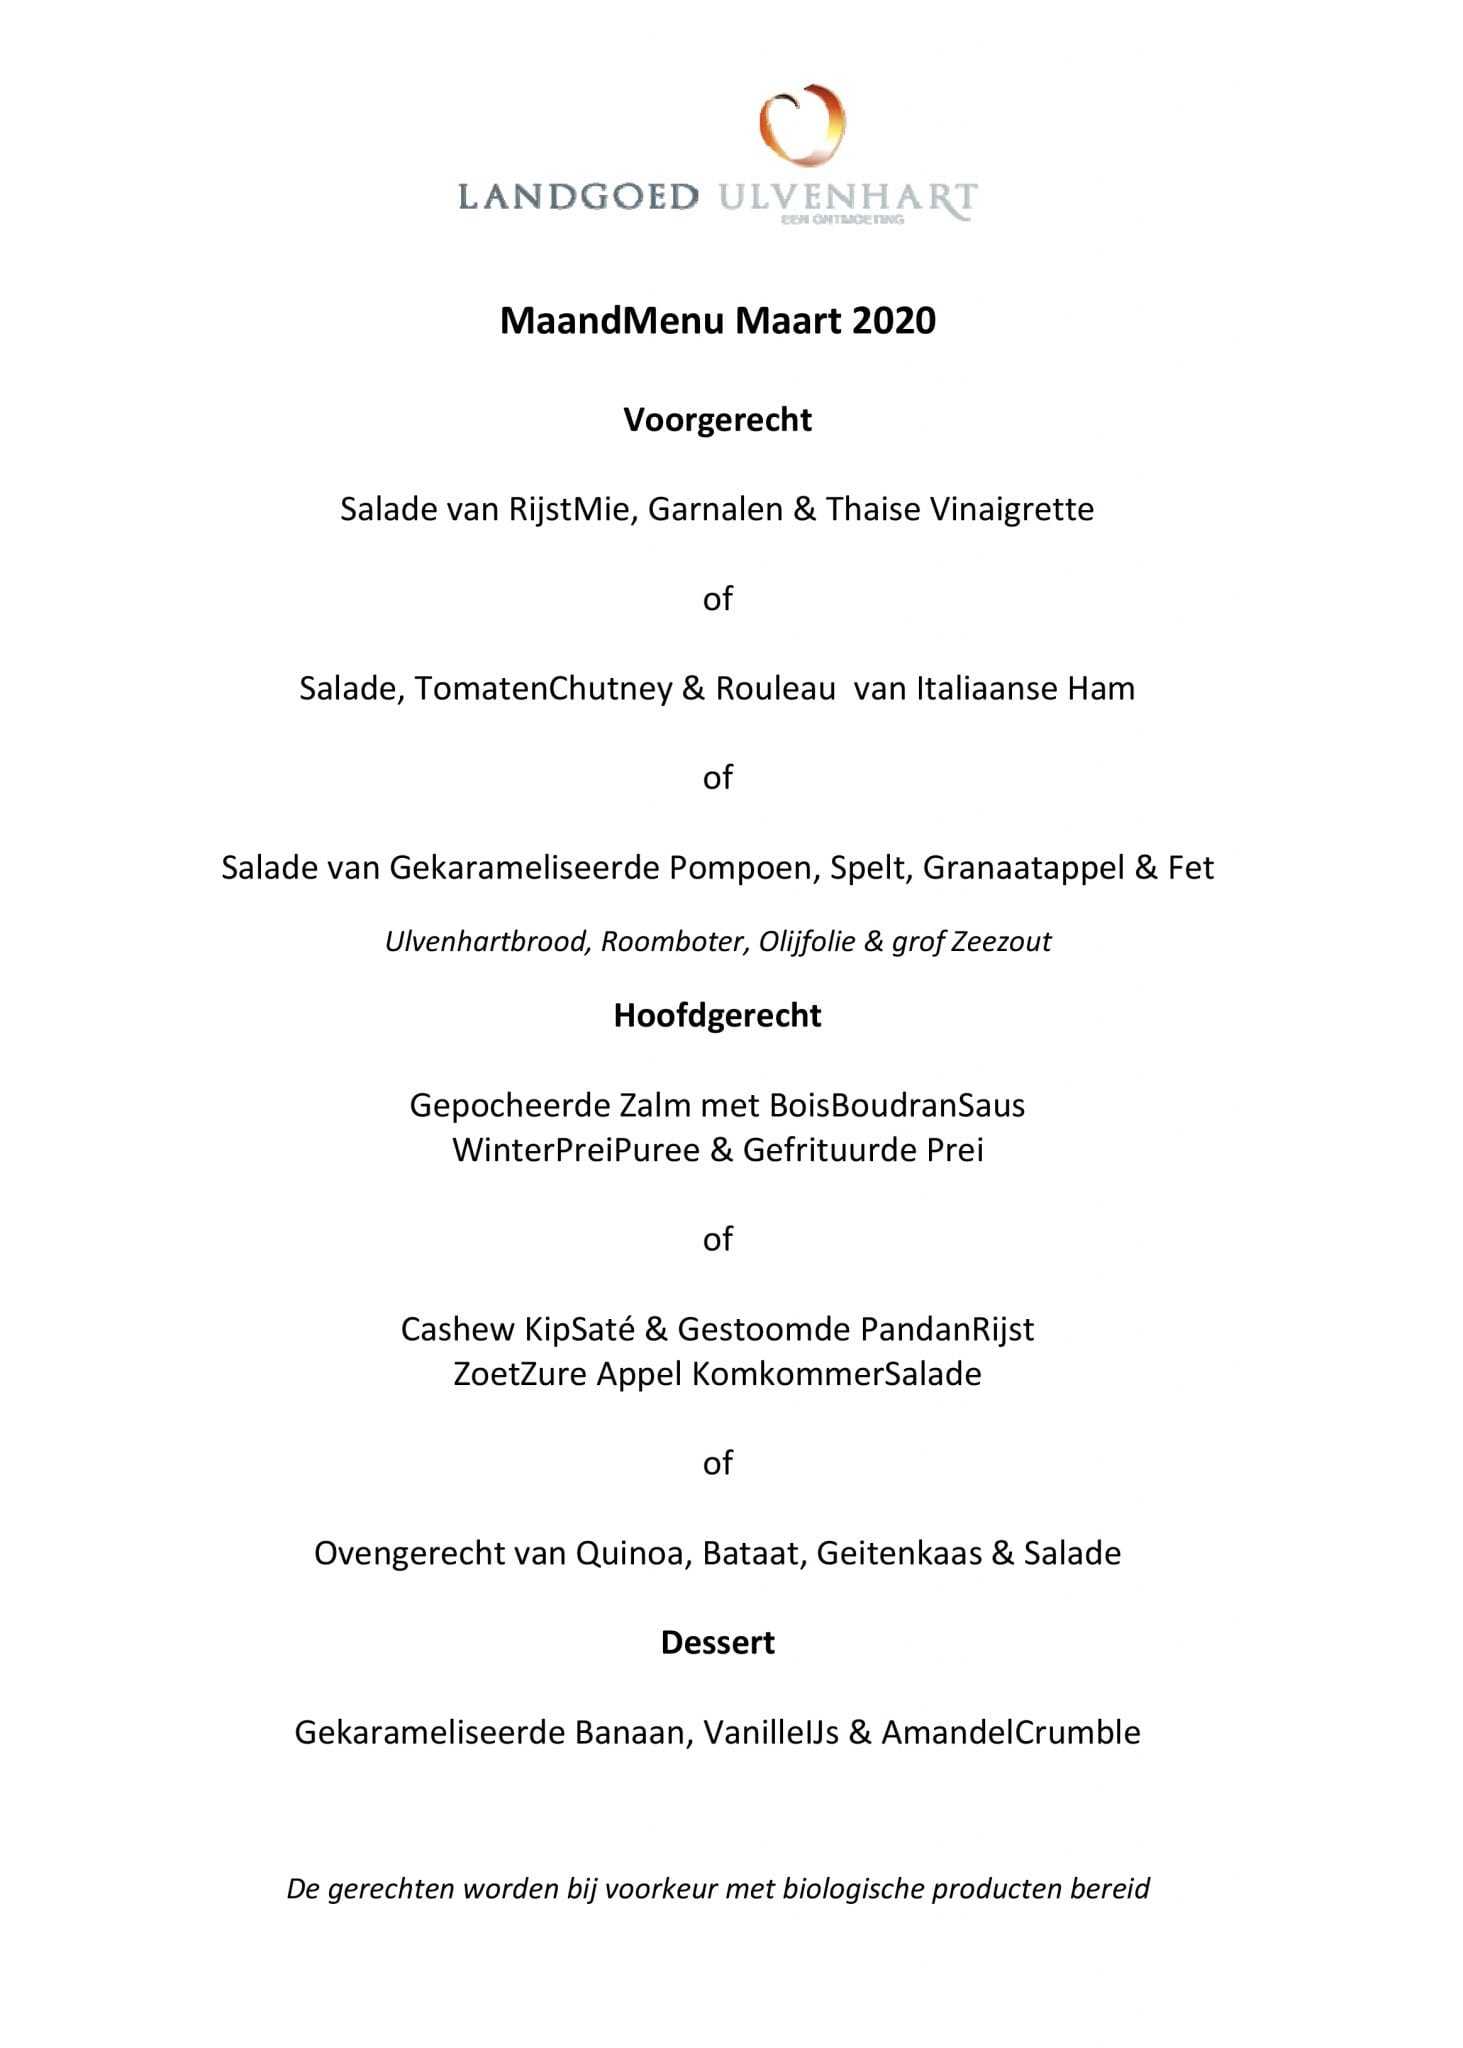 maand menu ulvenhart maart